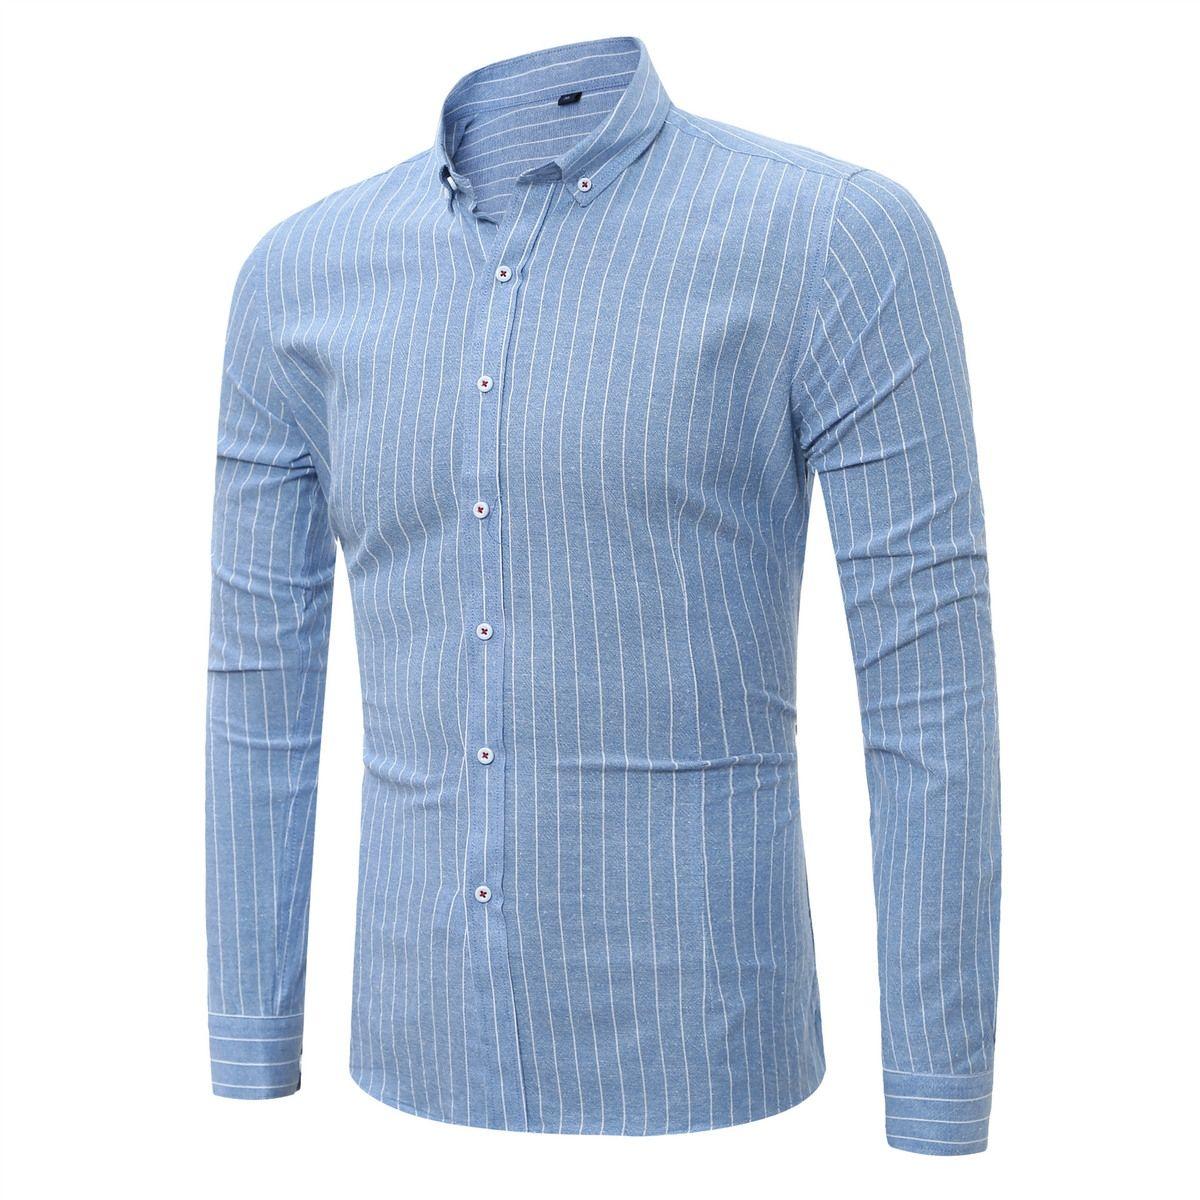 Stripe Shirt Men Long Sleeve New Brand Clothing Top Quality Slim Fit